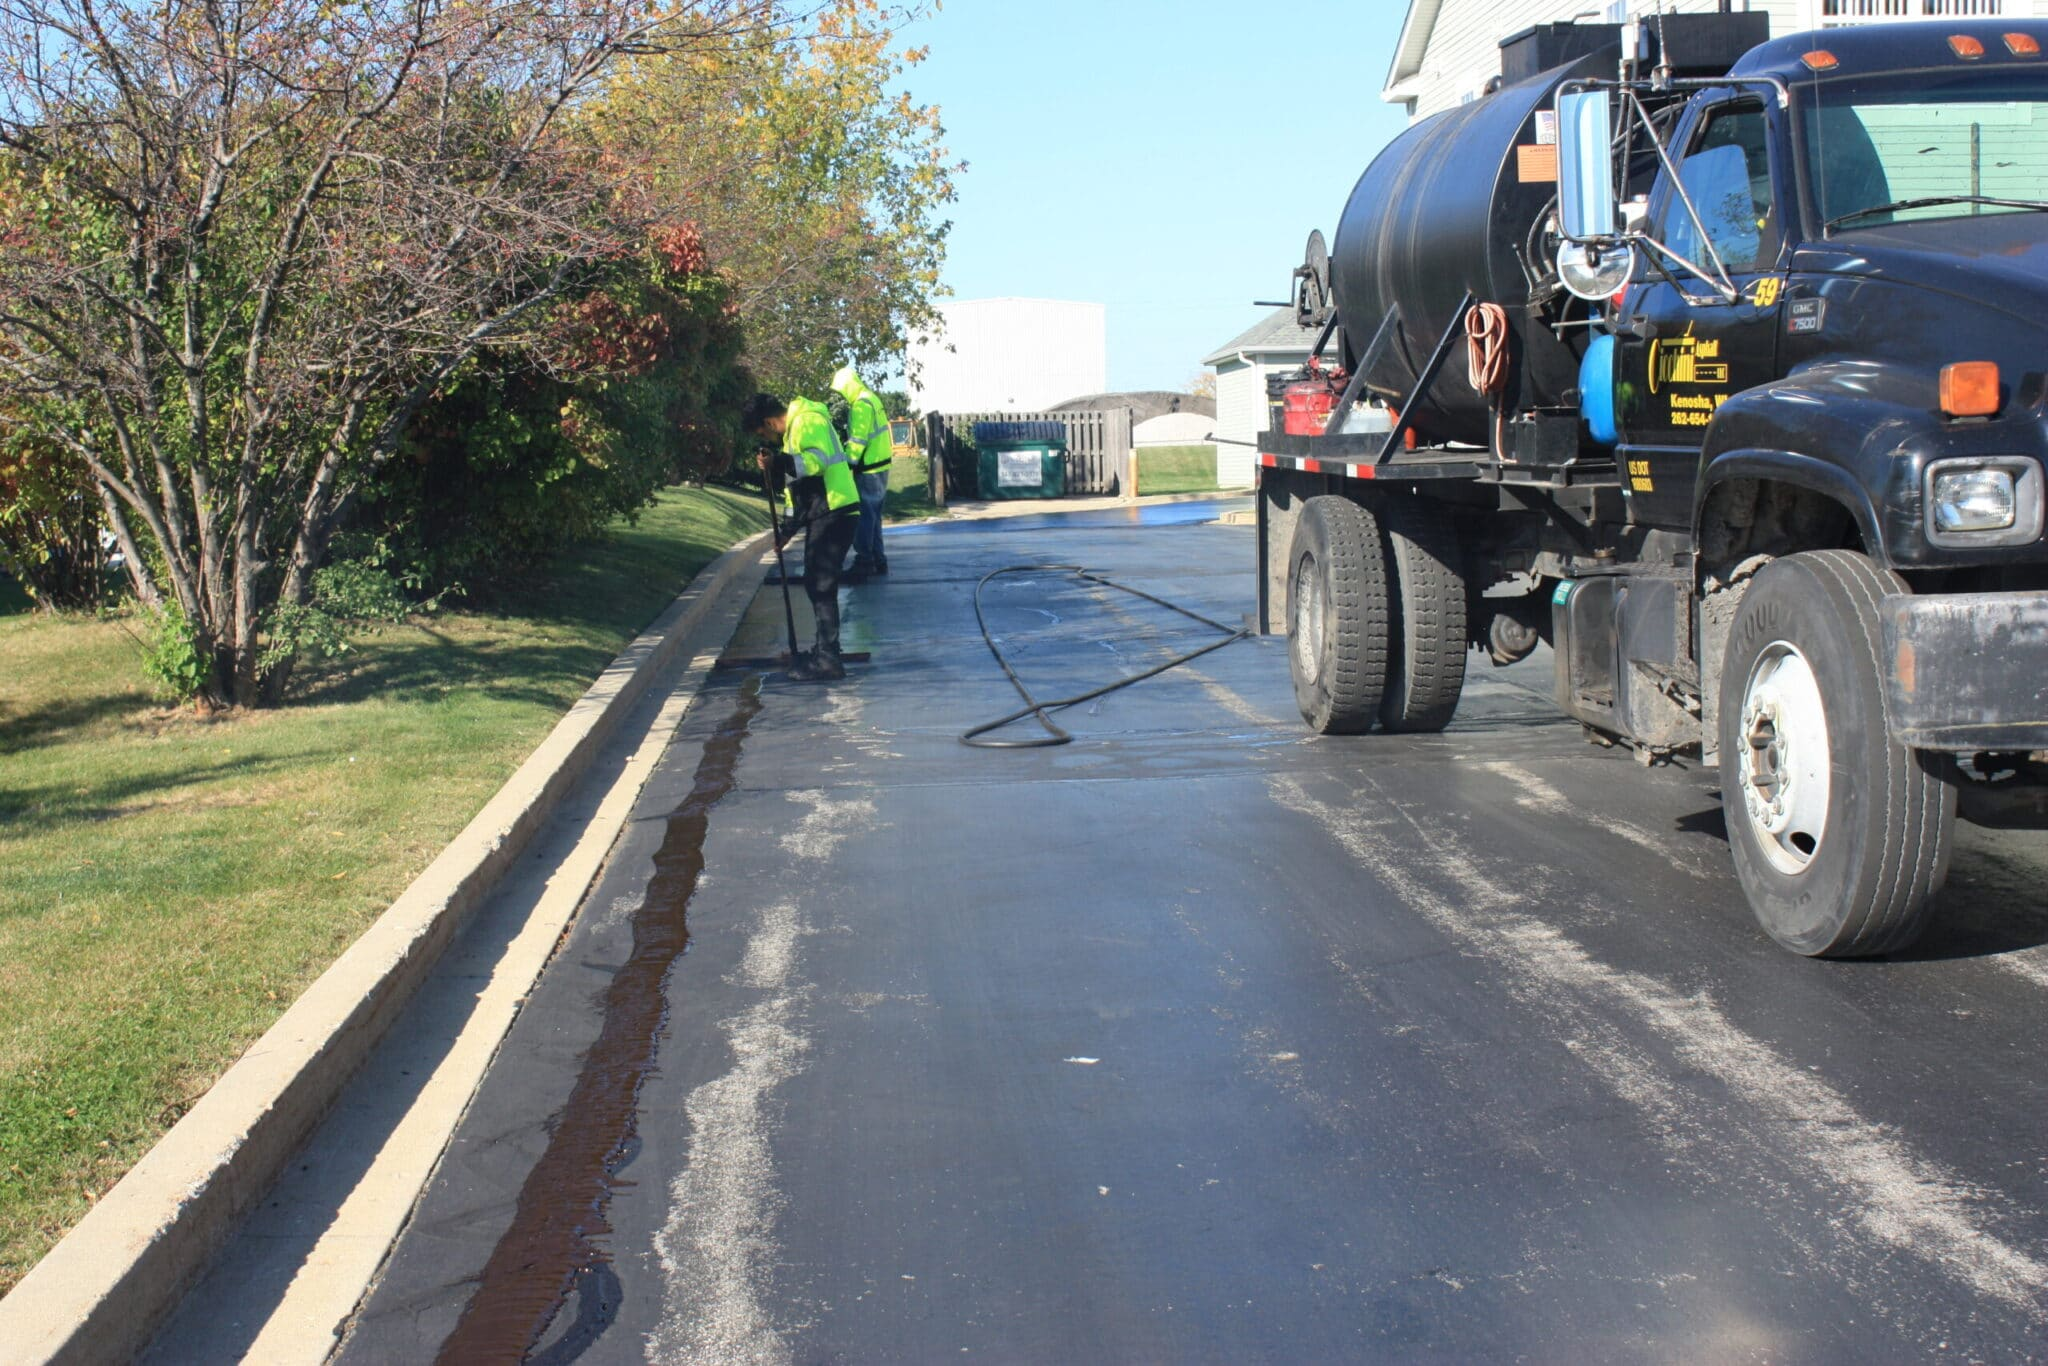 asphalt crack filling kenosha, kenosha asphalt crack filling, asphalt maintenance in kenosha